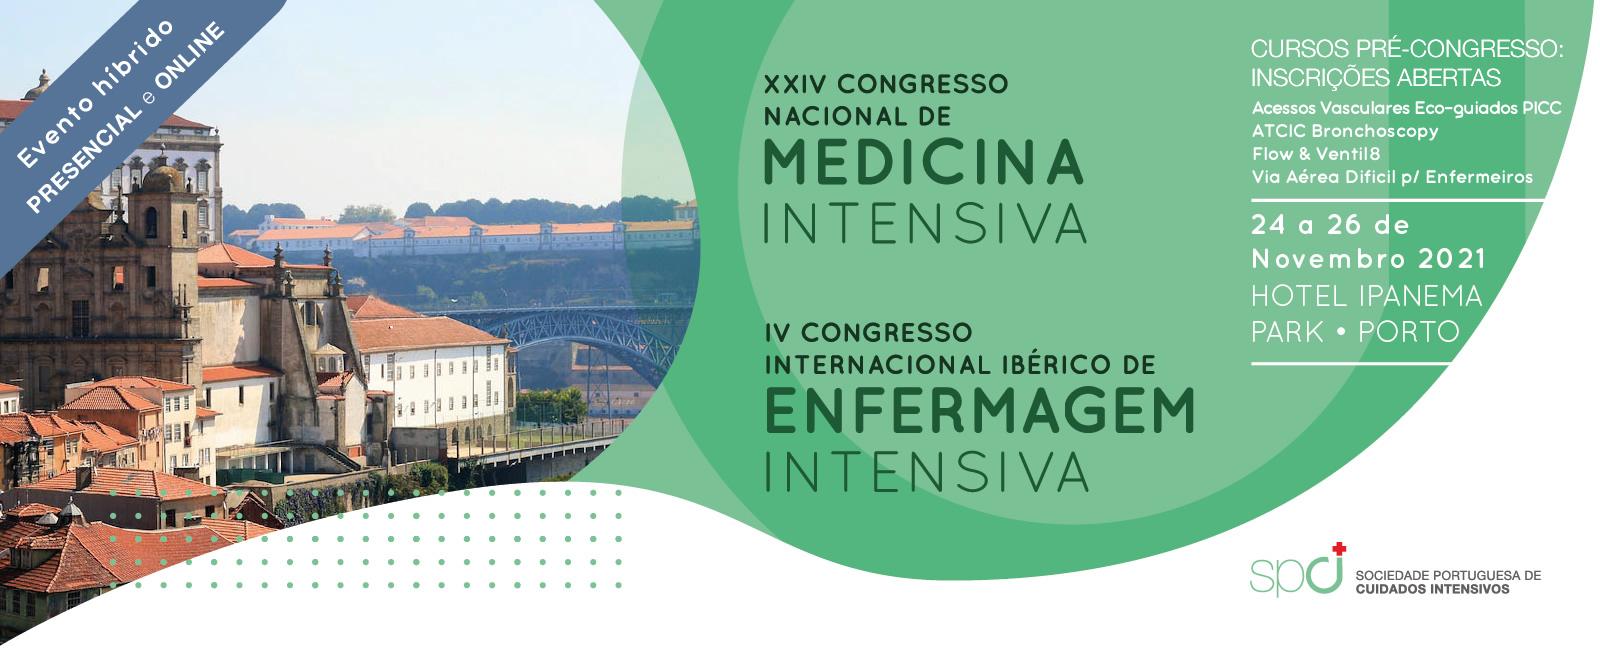 XXIV Congresso Nacional de Medicina Intensiva